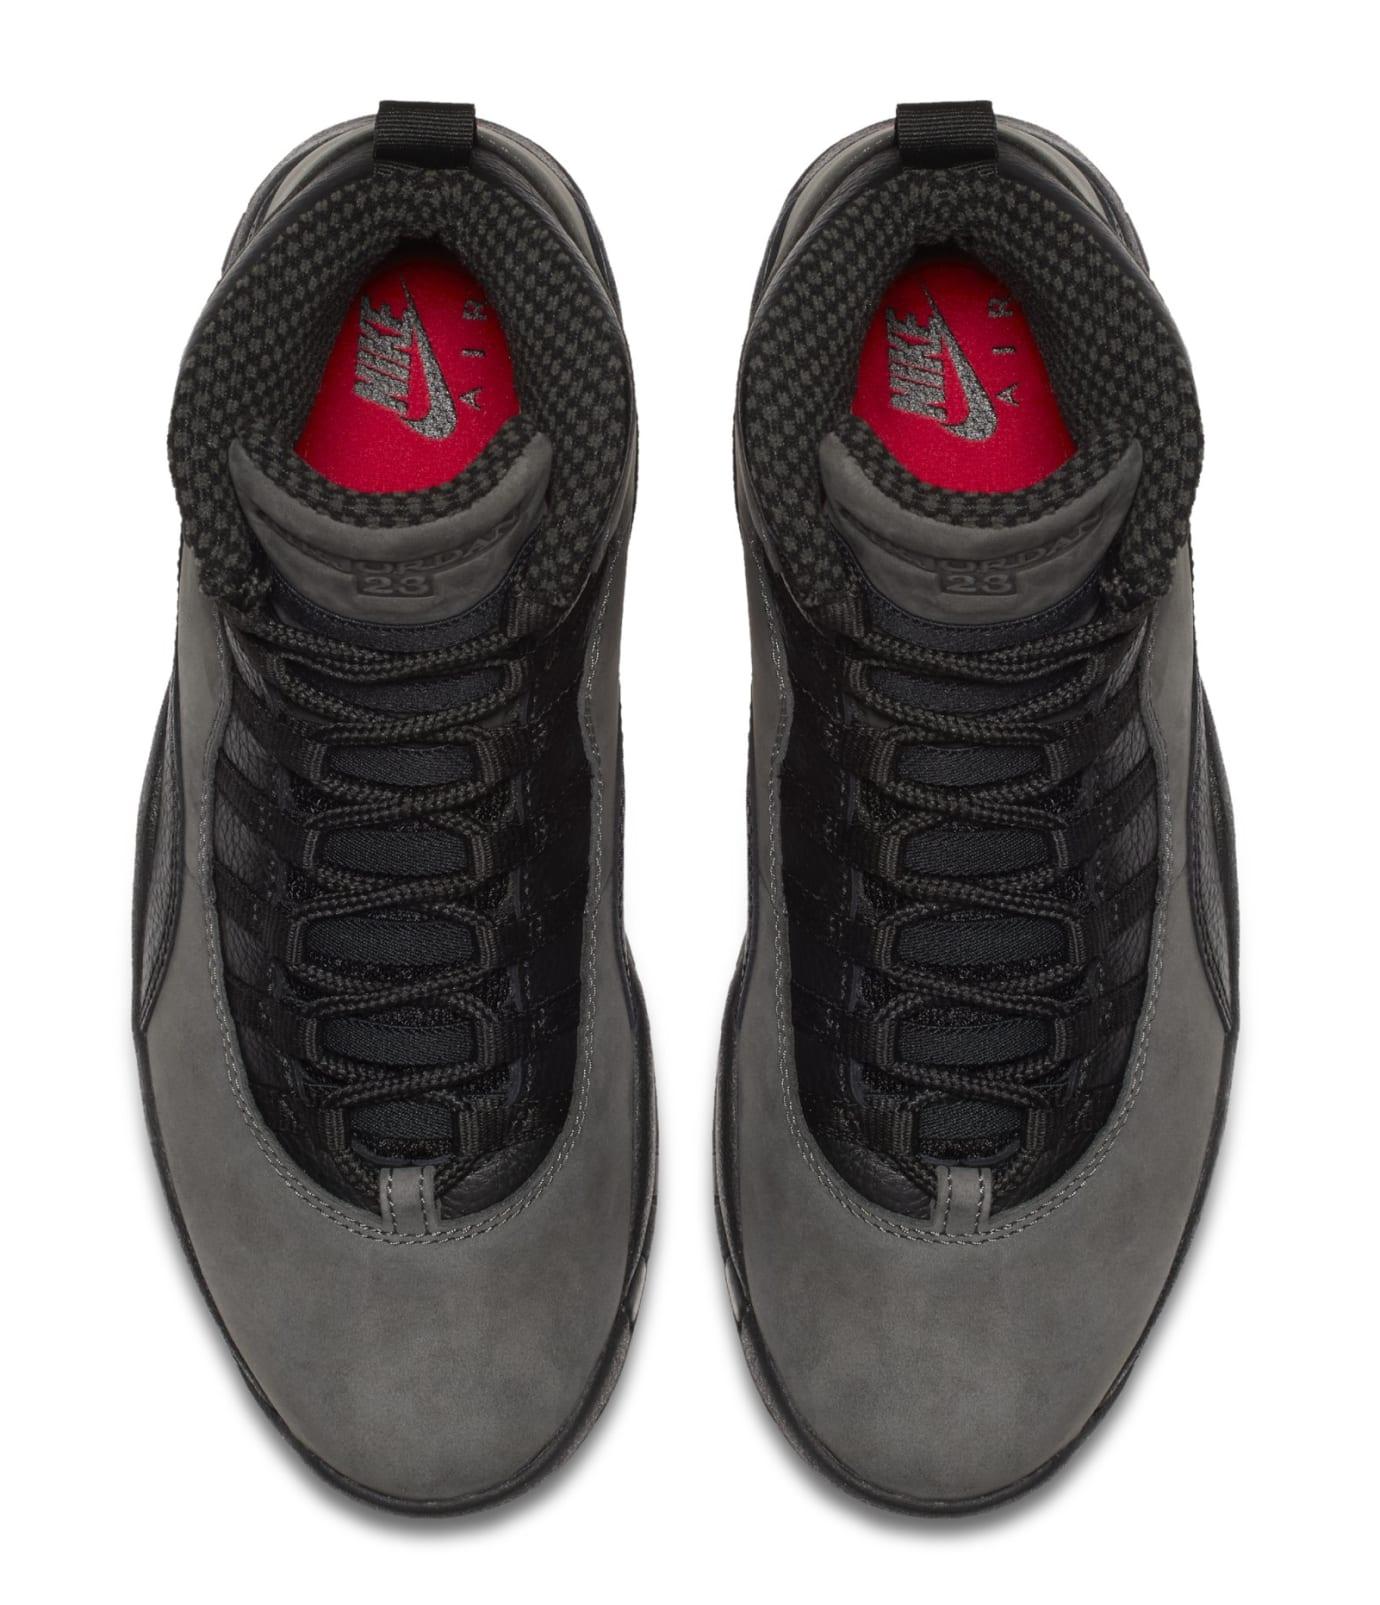 243dceea029 Air Jordan 10 X Shadow 2018 Release Date 310805-002   Sole Collector